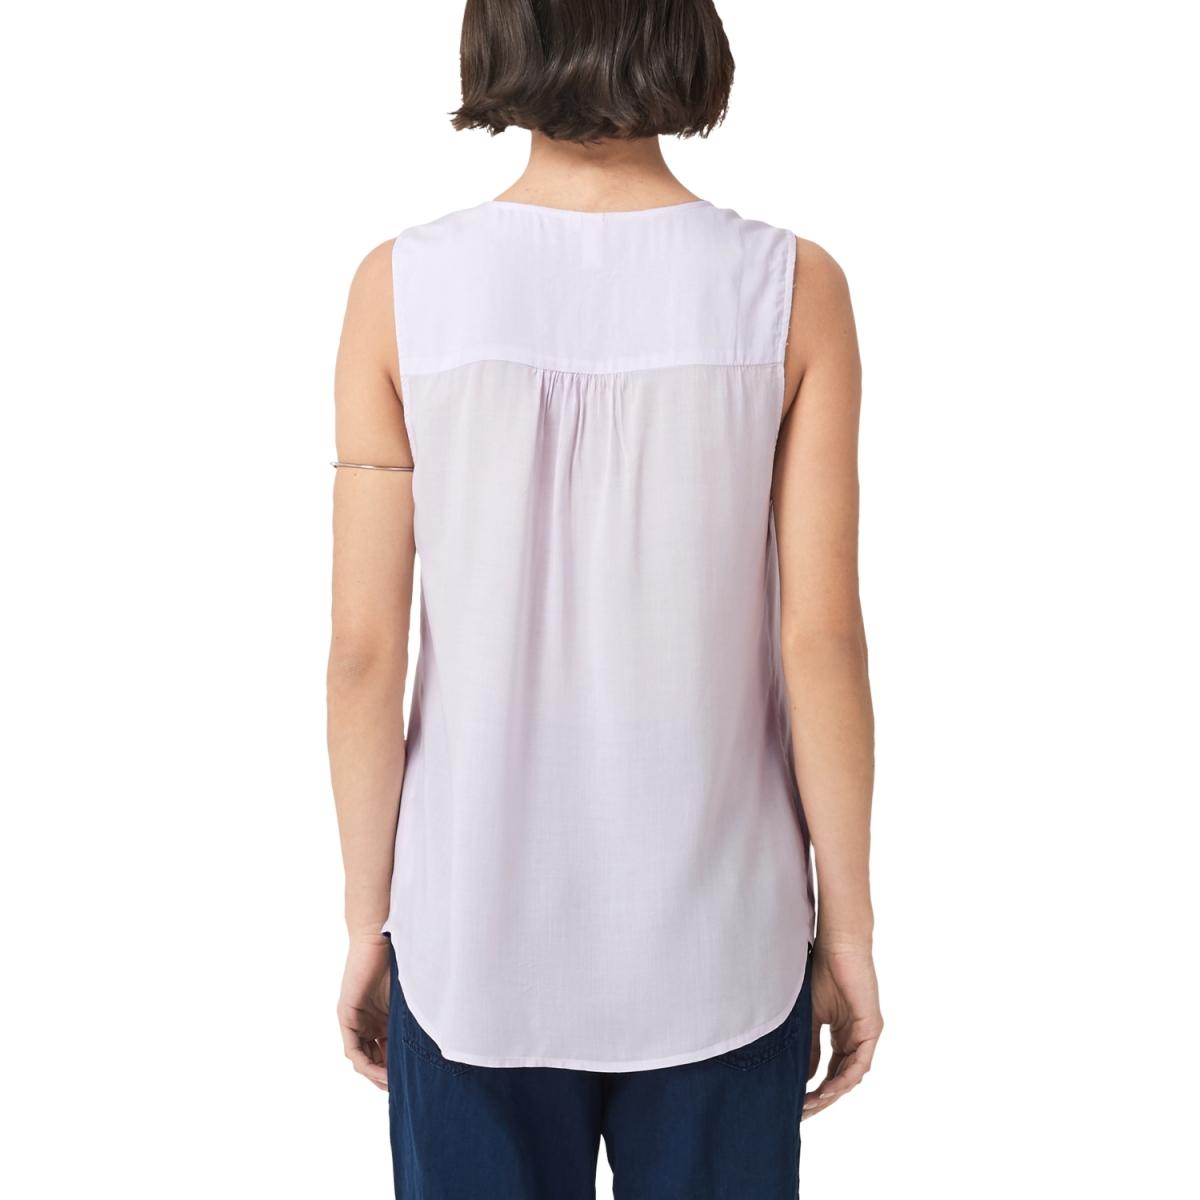 fijne blouse 41905133036 q/s designed by blouse 4025